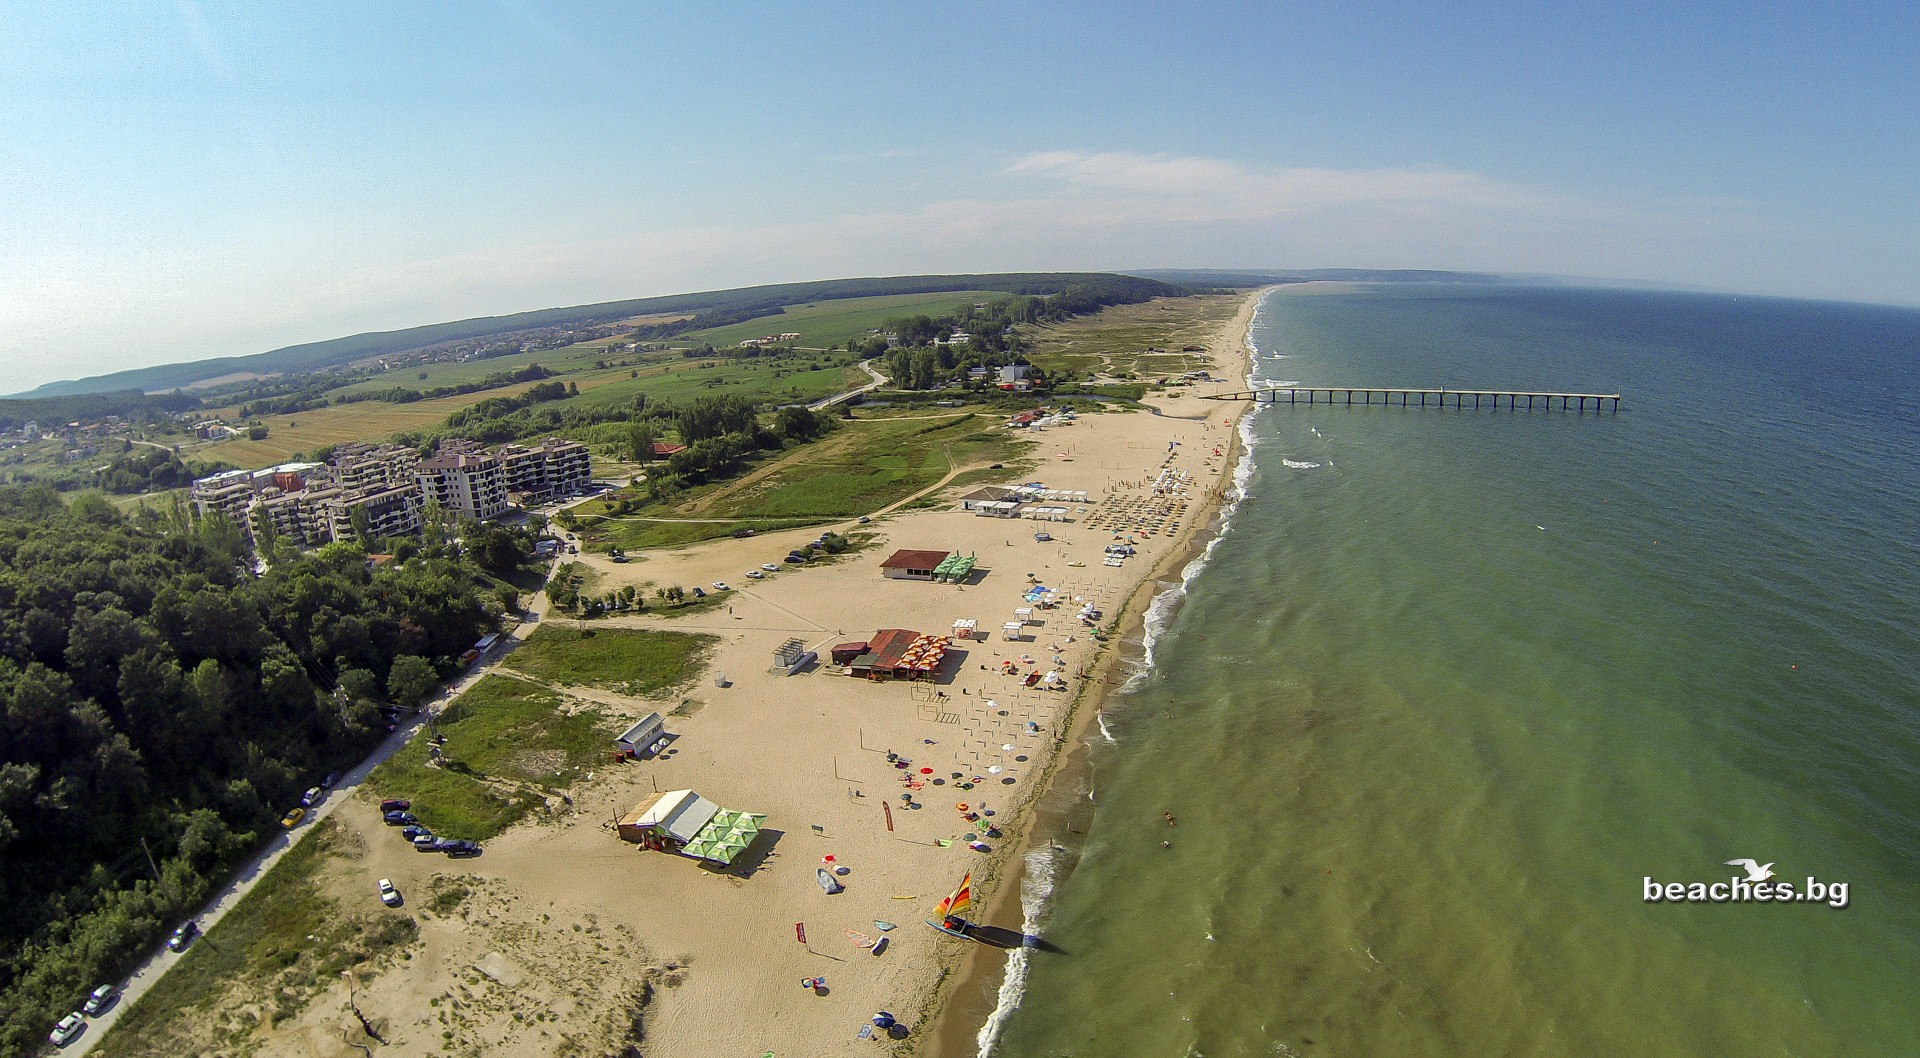 beaches.bg - Плаж Шкорпиловци, България